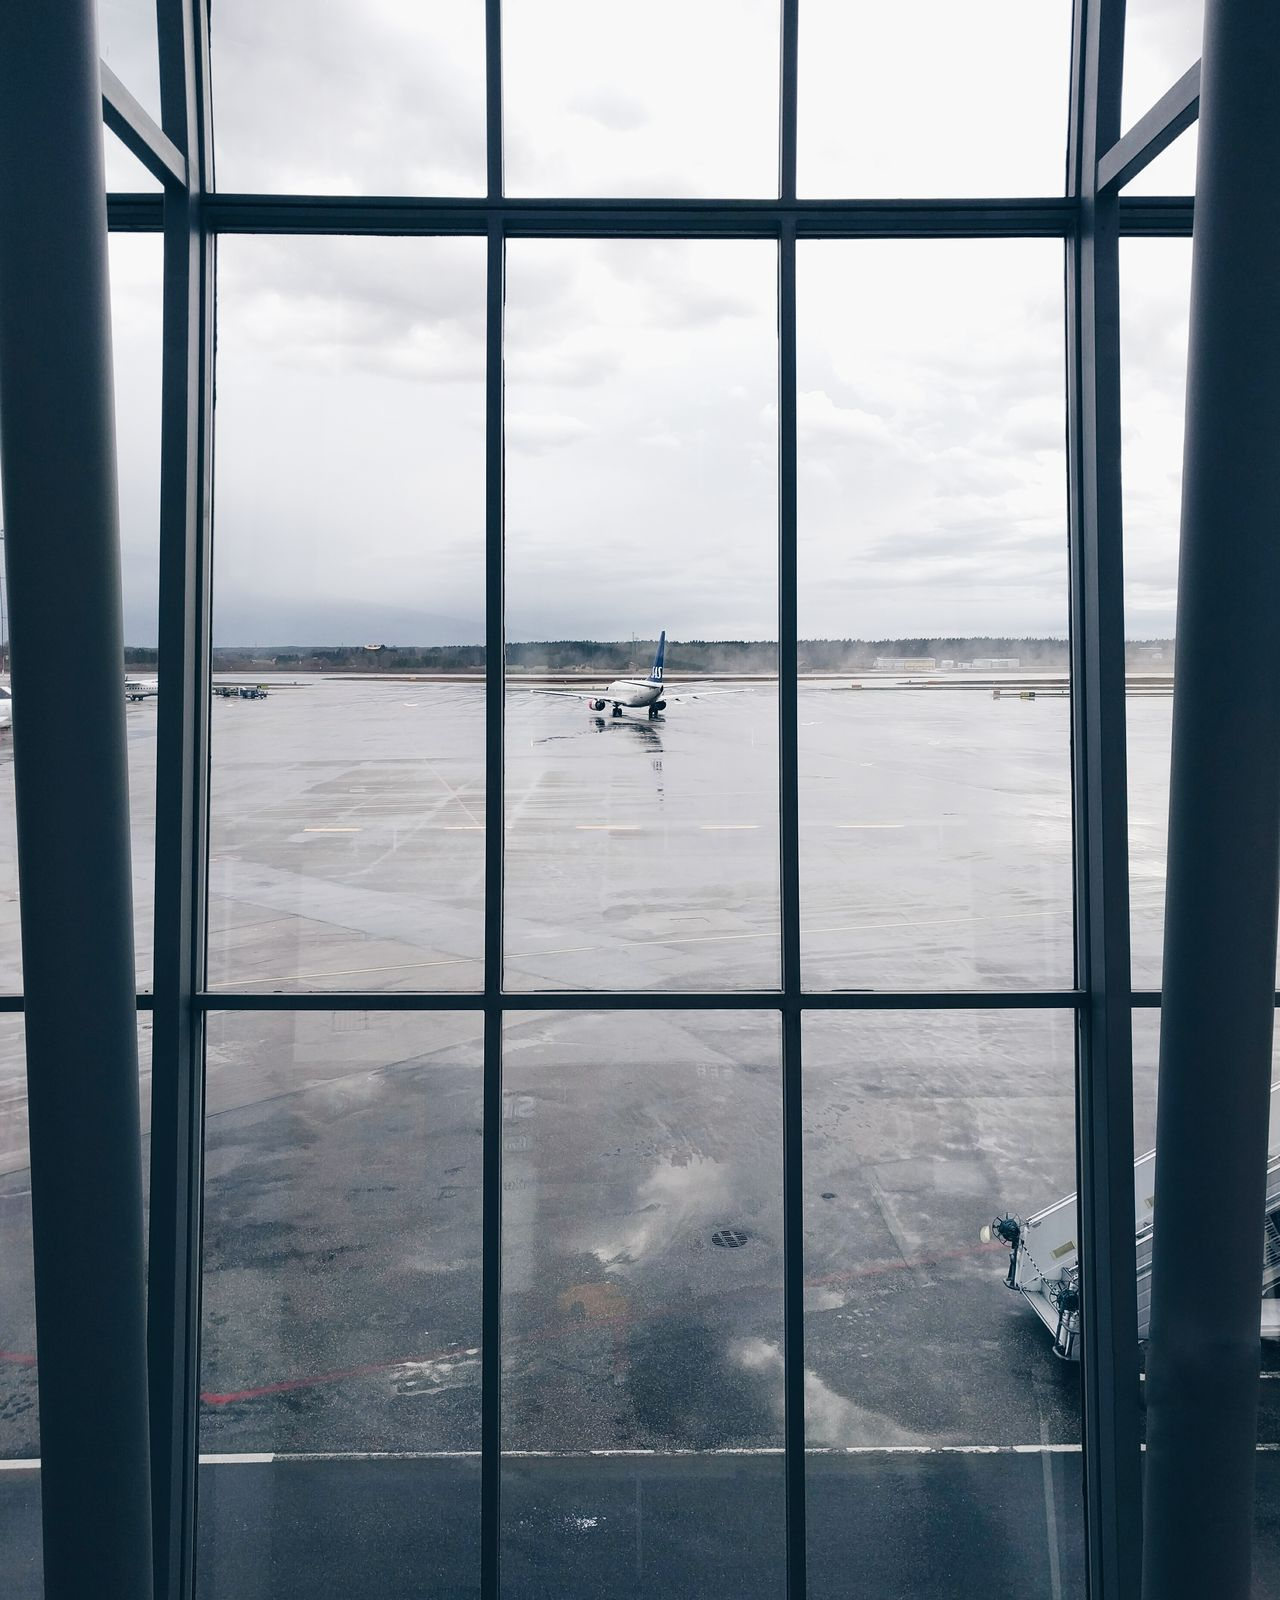 Waiting for the train 🚄 Stockholm Arlanda Airport Aviation Scandinavia Scandinavianairlines Sweden Airport Waiting First Eyeem Photo